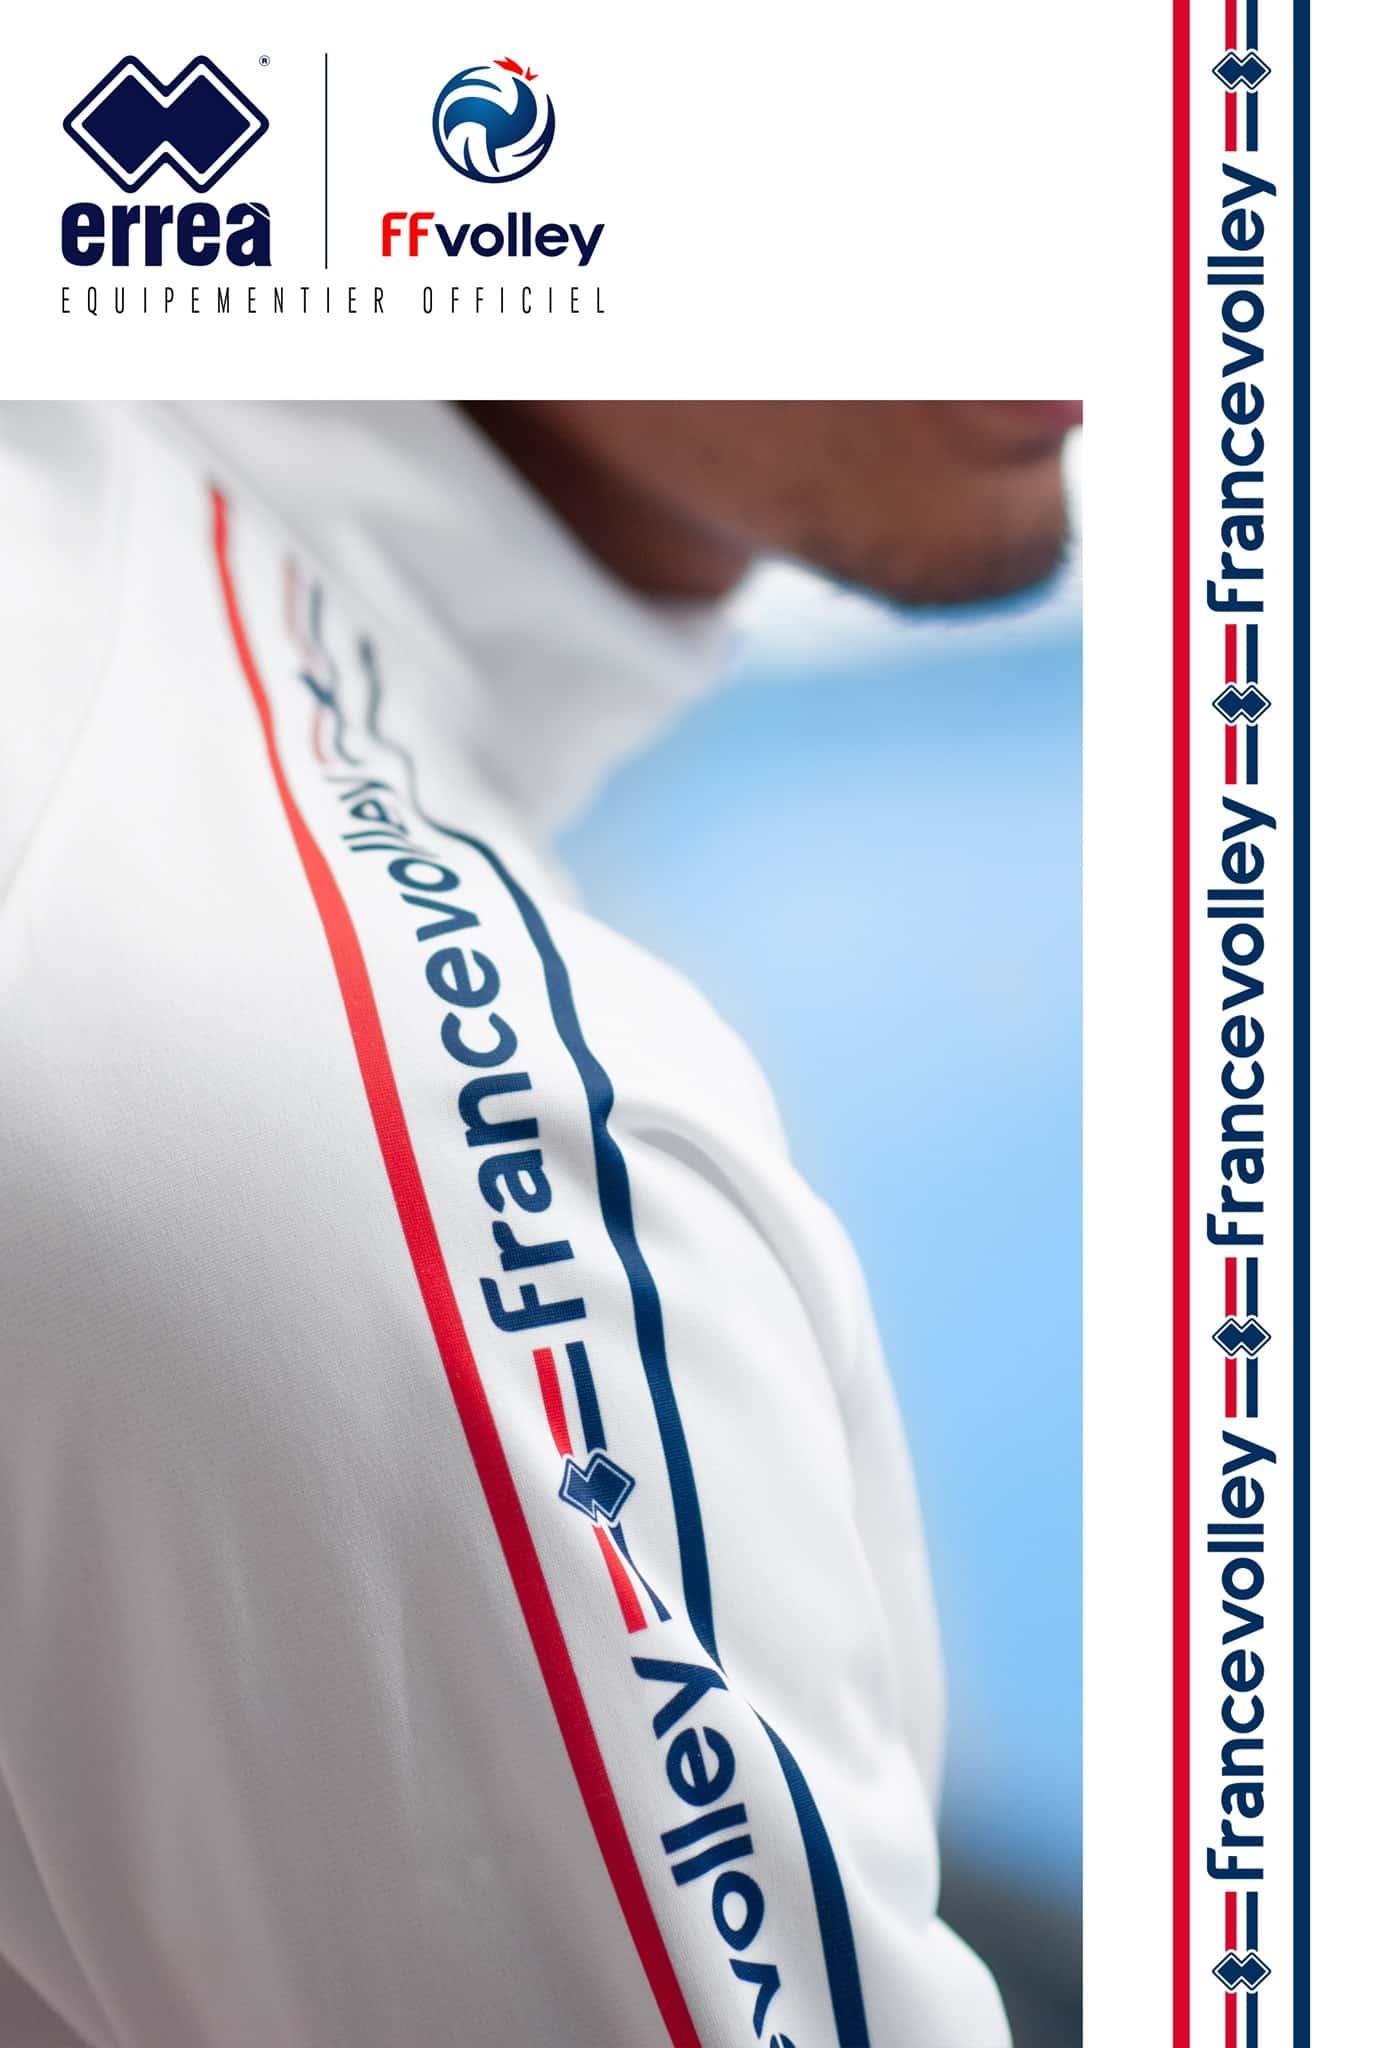 un-nouveau-maillot-errea-de-lequipe-de-france-de-volley-a-venir-5